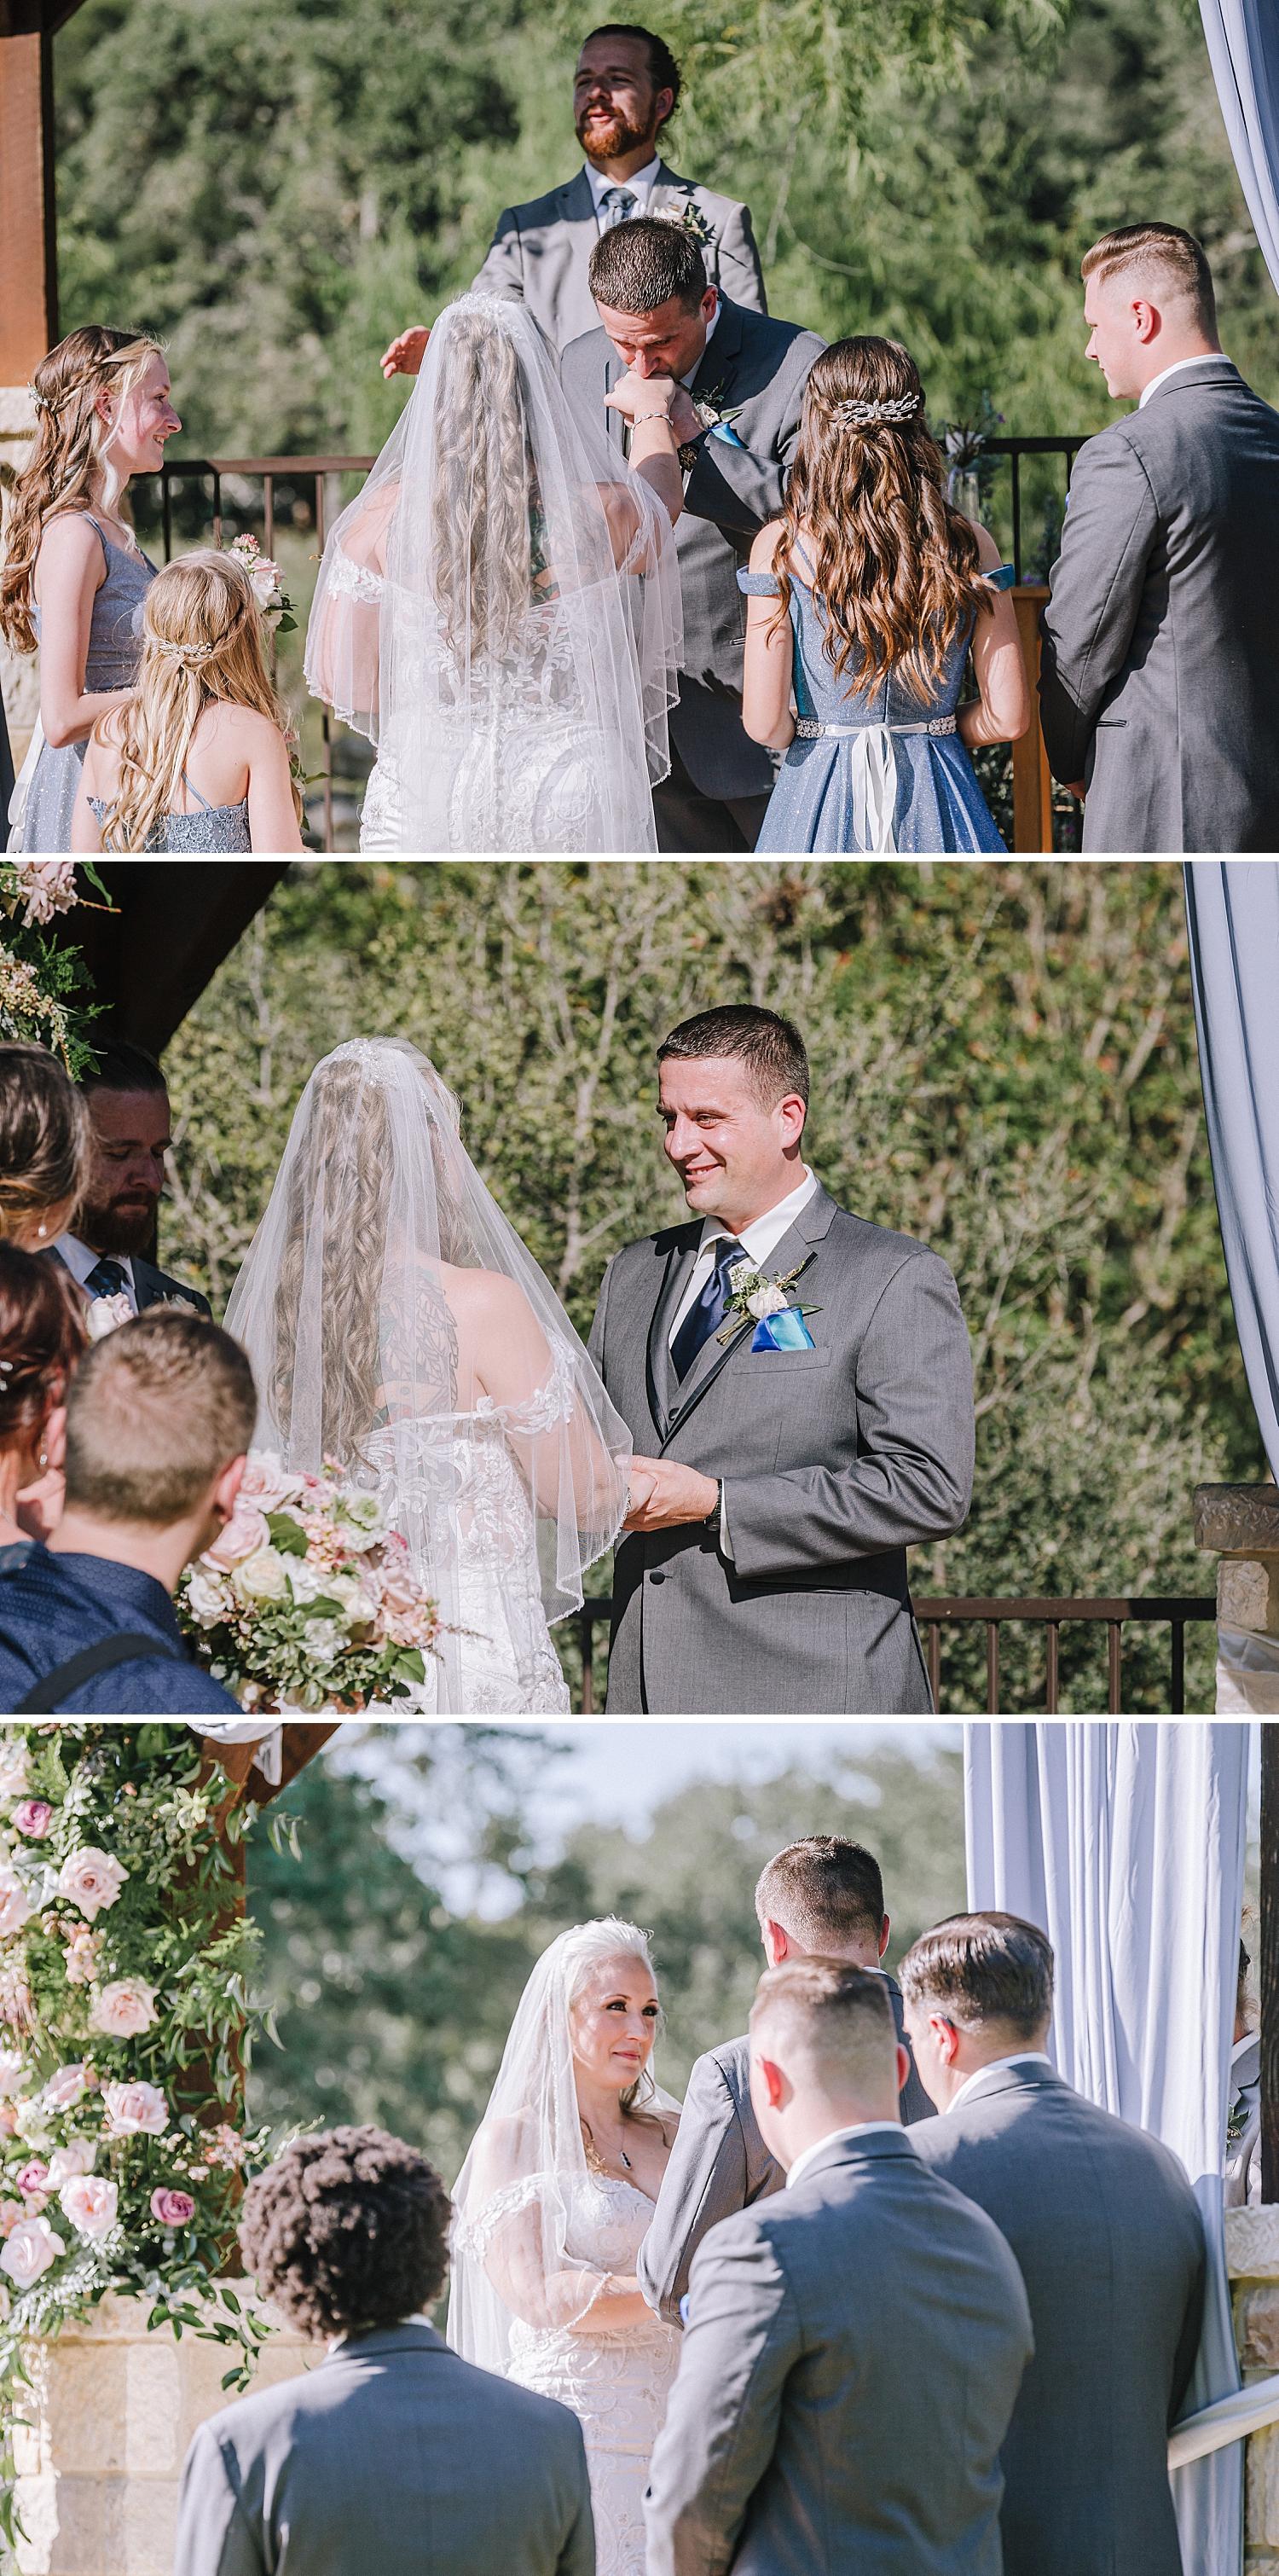 The-Club-at-Garden-Ridge-Military-Wedding-Carly-Barton-Photography_0065.jpg